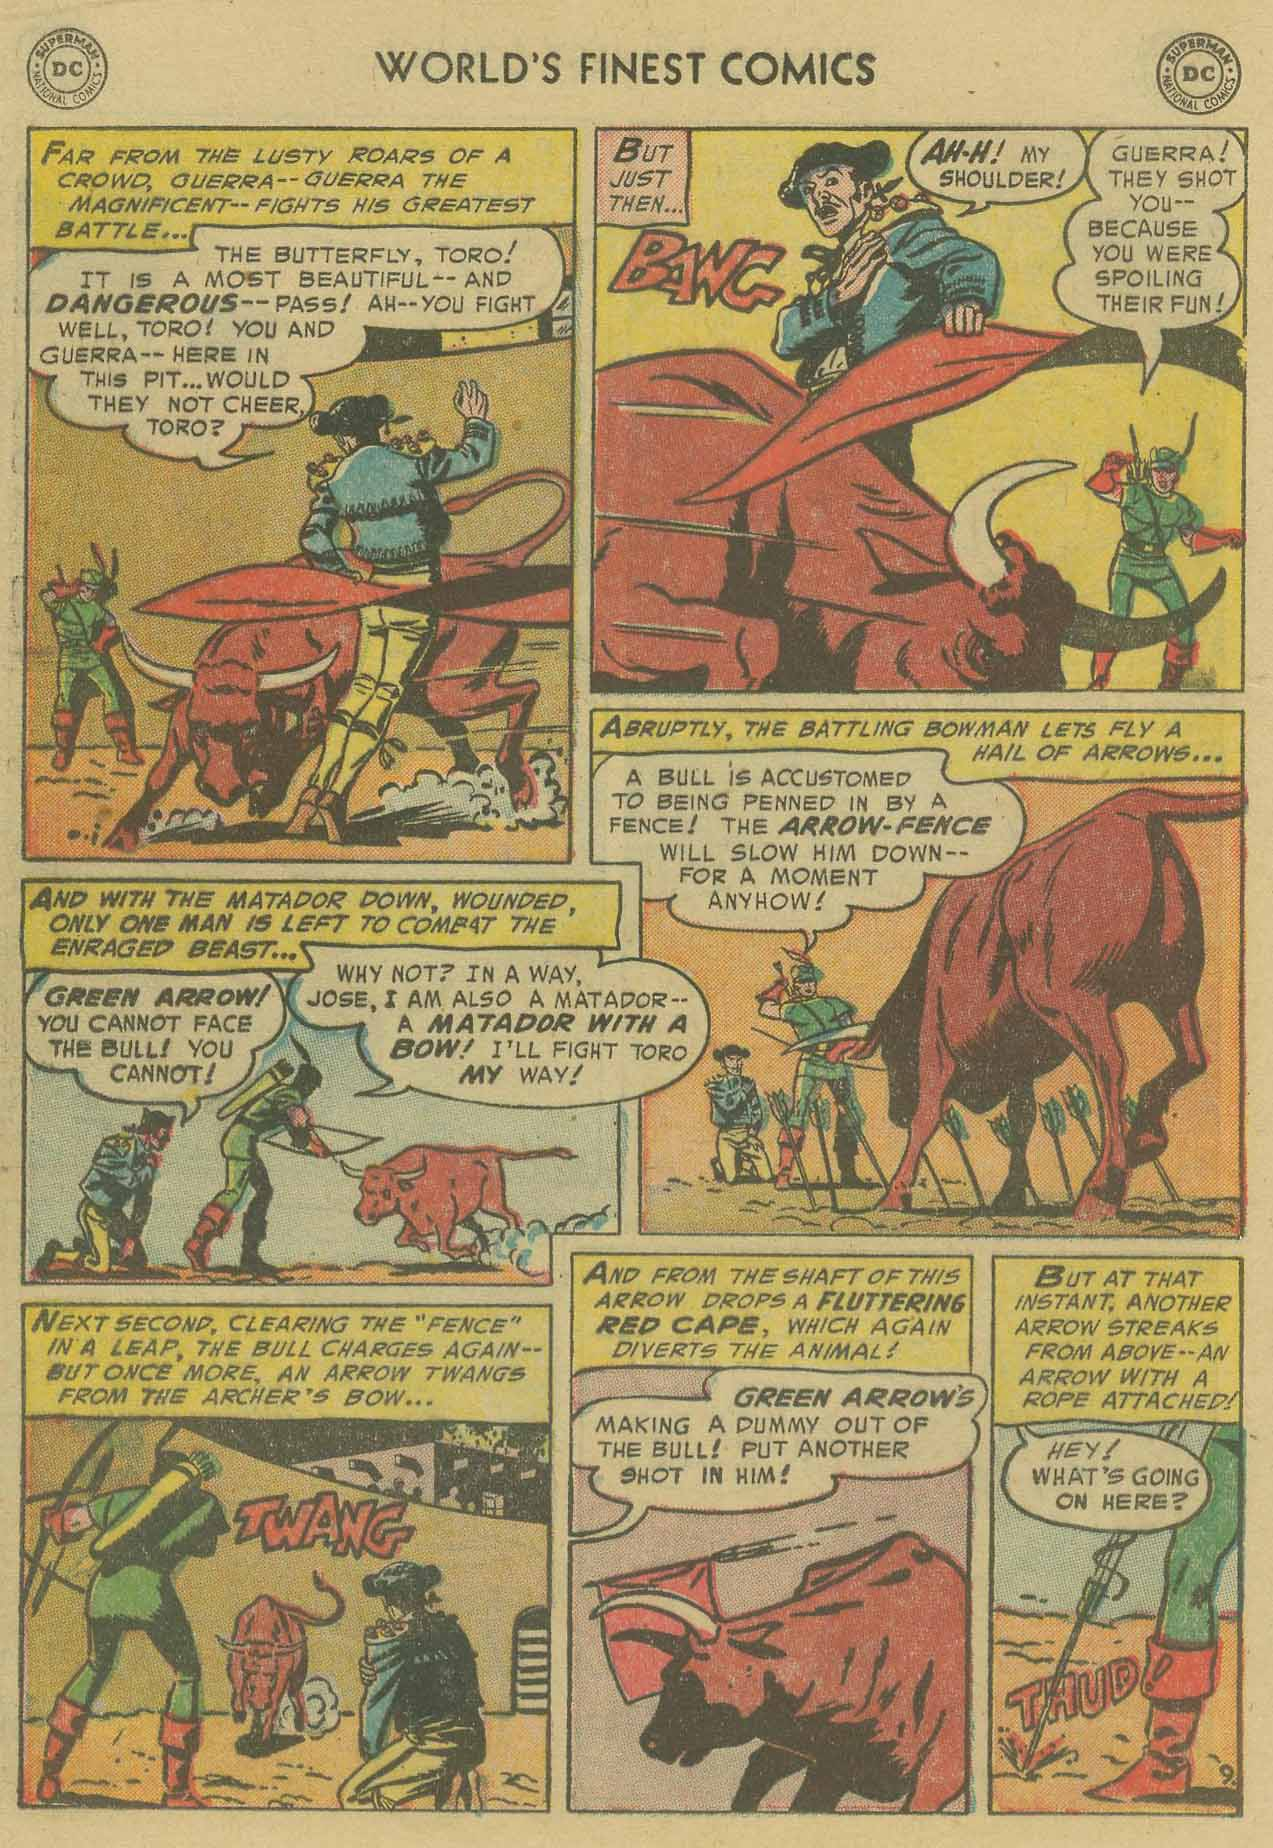 Read online World's Finest Comics comic -  Issue #69 - 36